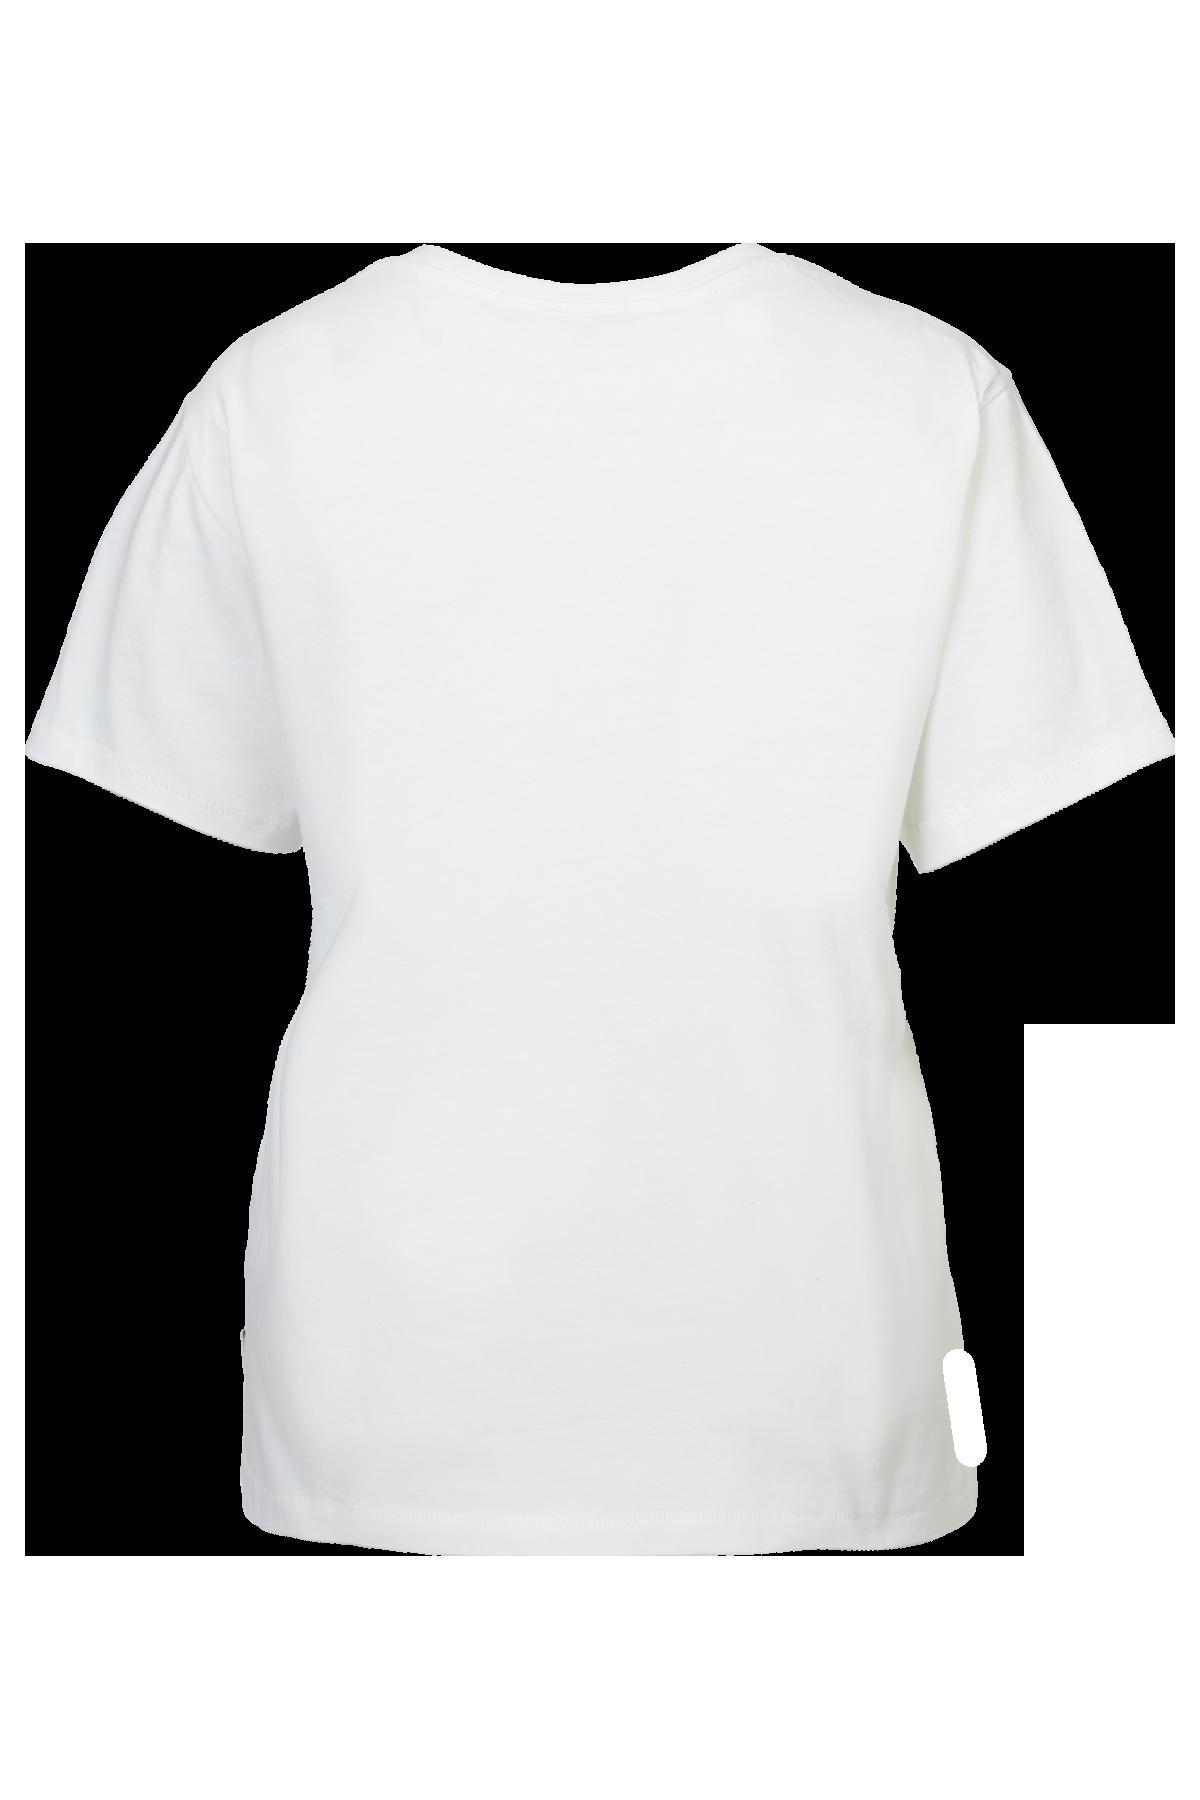 T-shirt Evelyn ET